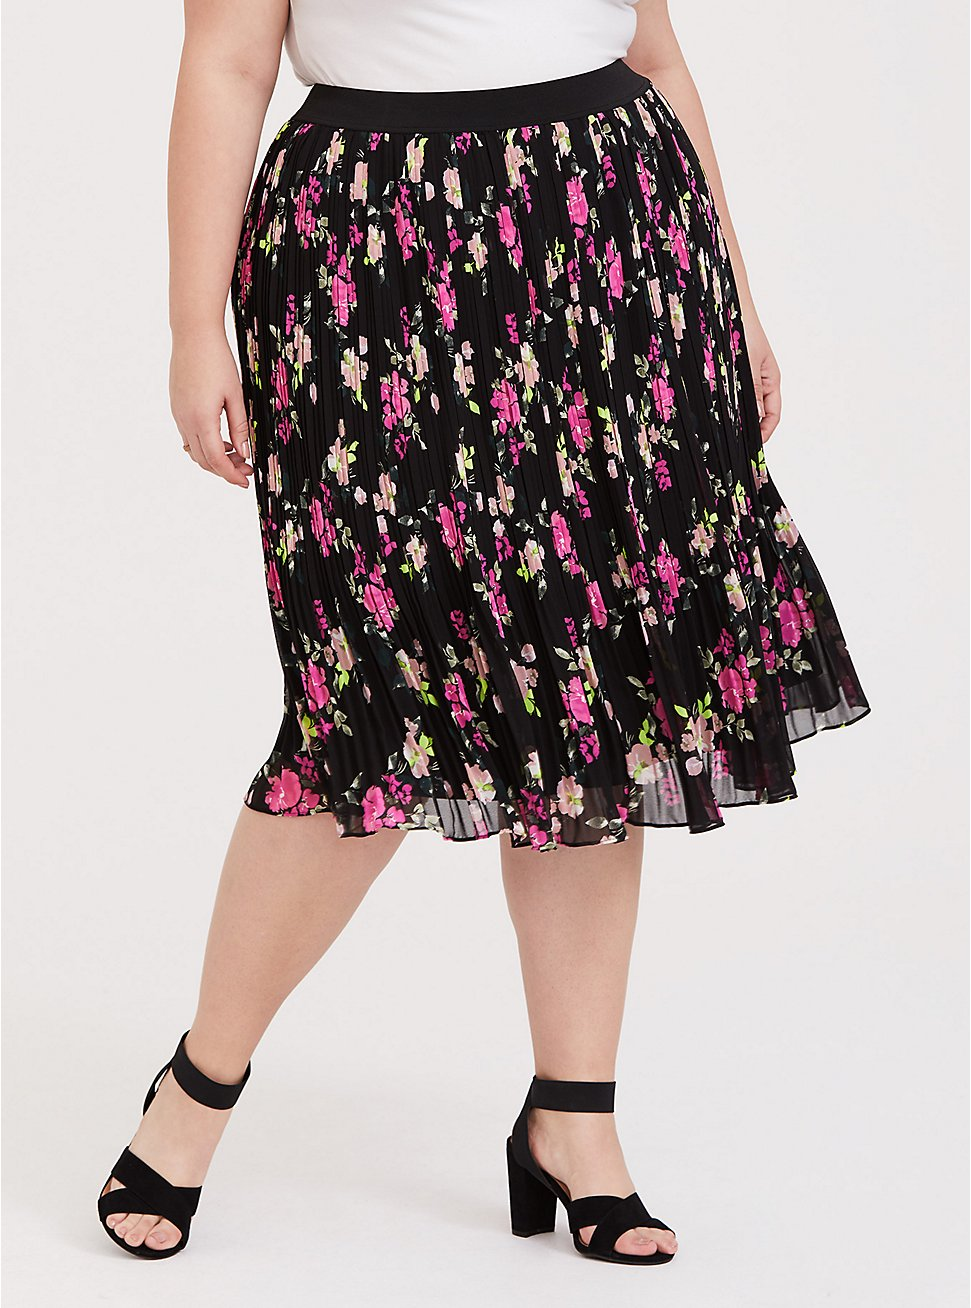 Plus Size Black Floral Chiffon Pleated Midi Skirt, FLORAL - BLACK, hi-res